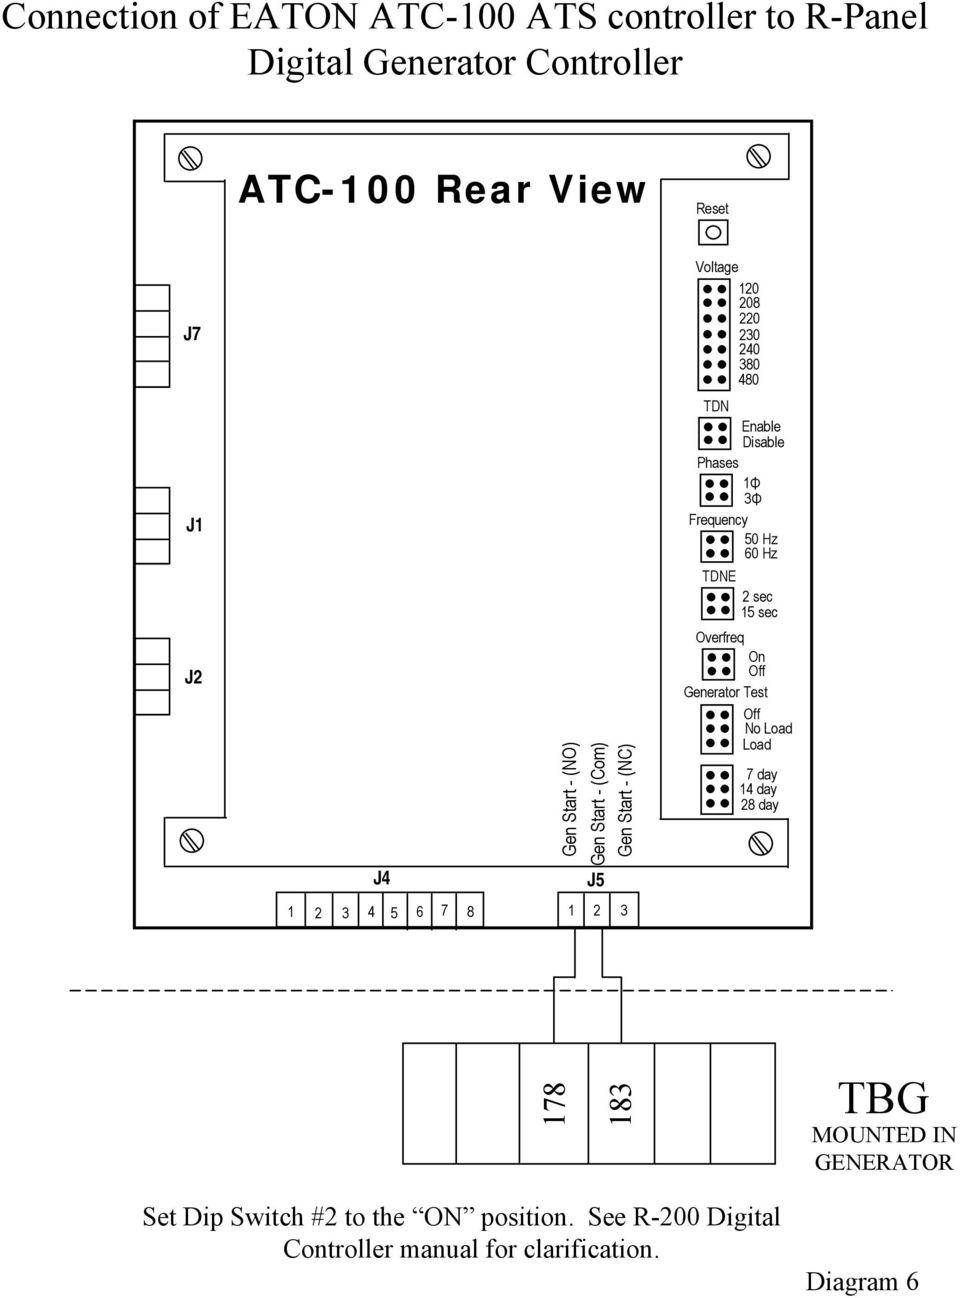 medium resolution of 3 frequency 50 hz 60 hz tdne 2 sec 15 sec overfreq on off generator test